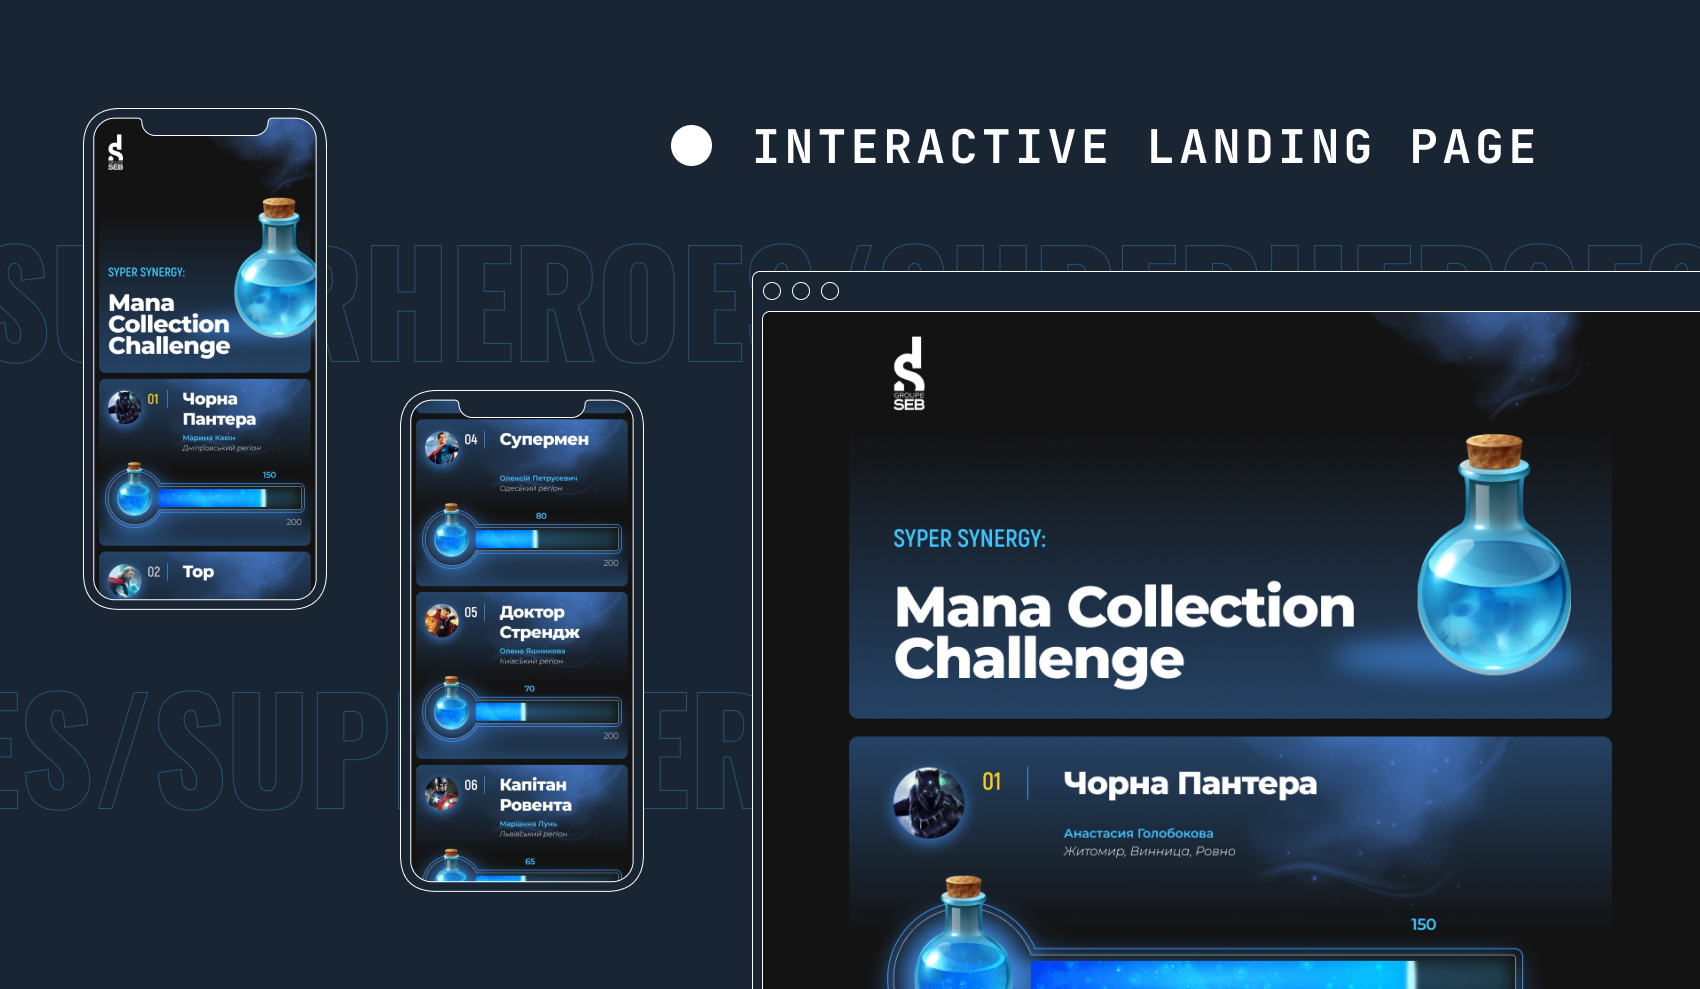 Mana Collection Challenge